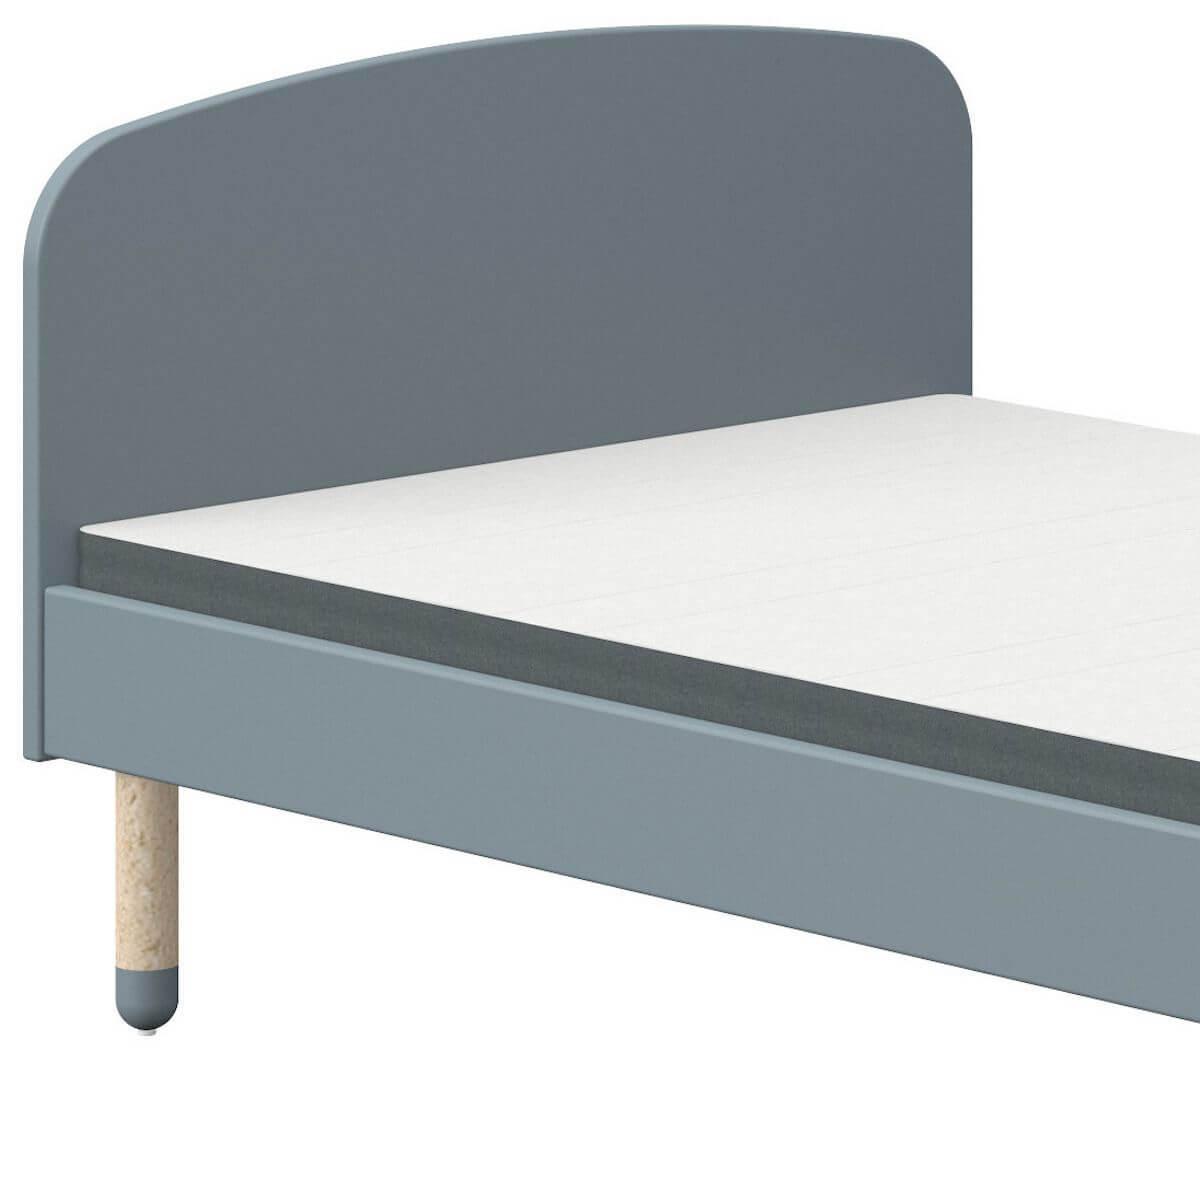 Lit 90x190cm DOTS Flexa bleu